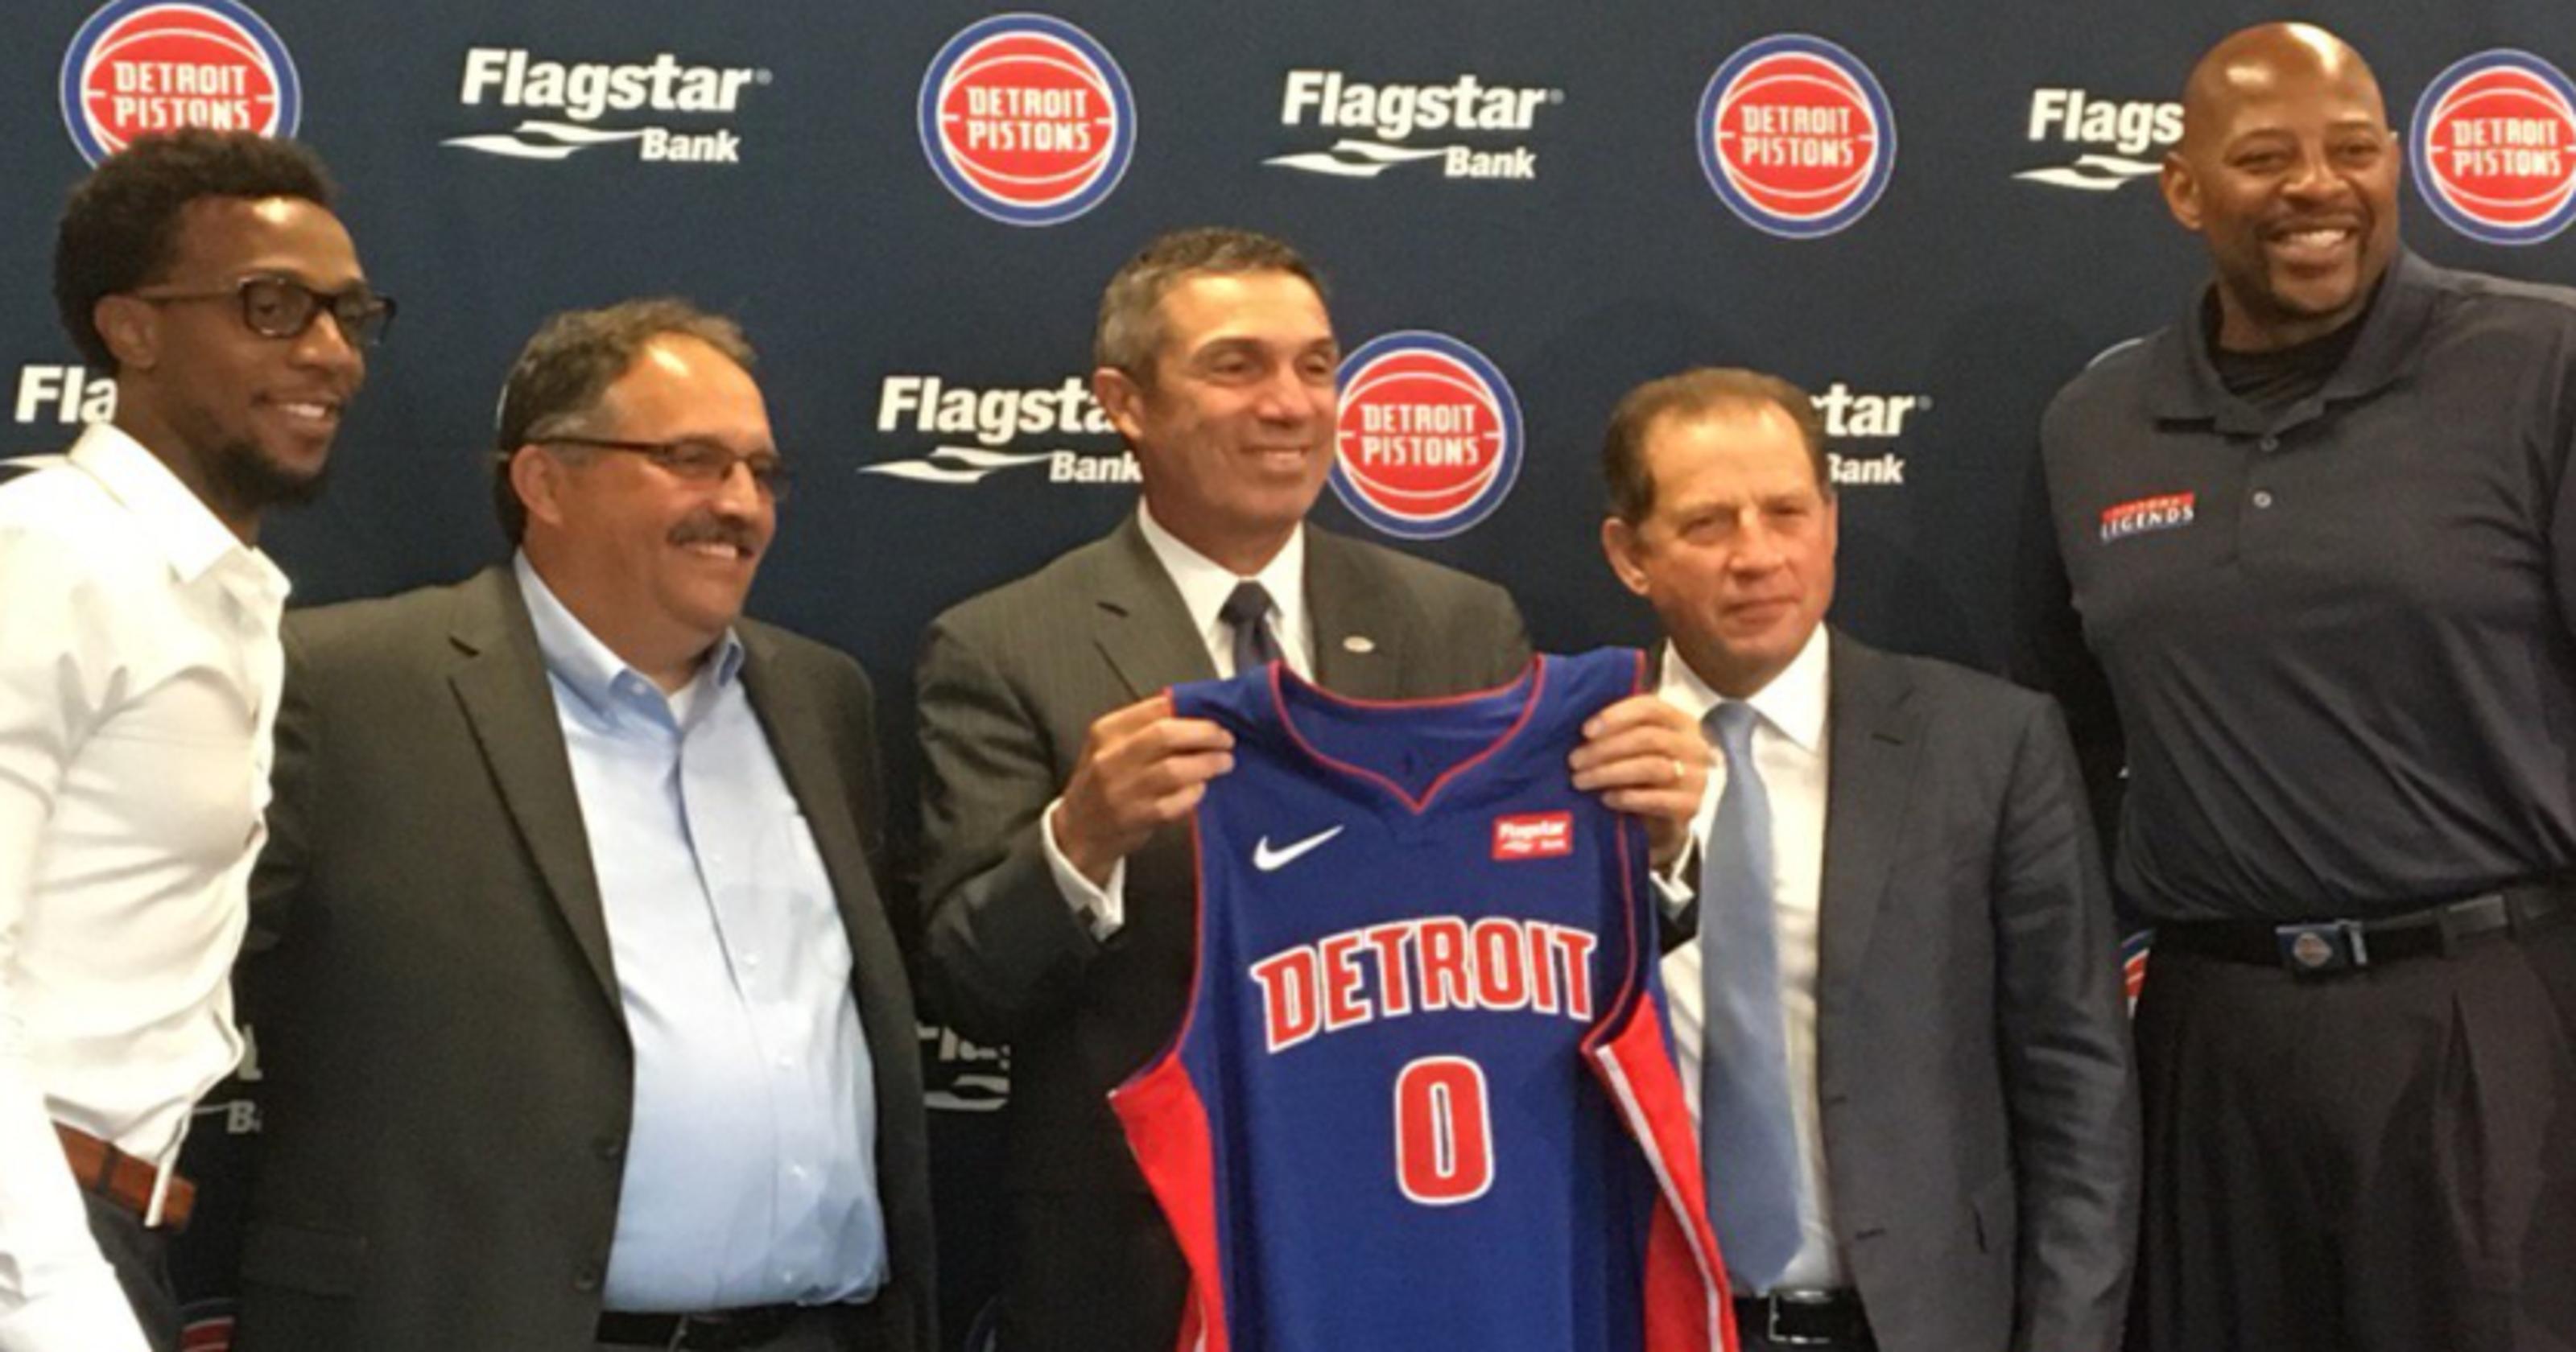 Detroit Pistons will add Flagstar Bank as jersey ad sponsor e25cd9635